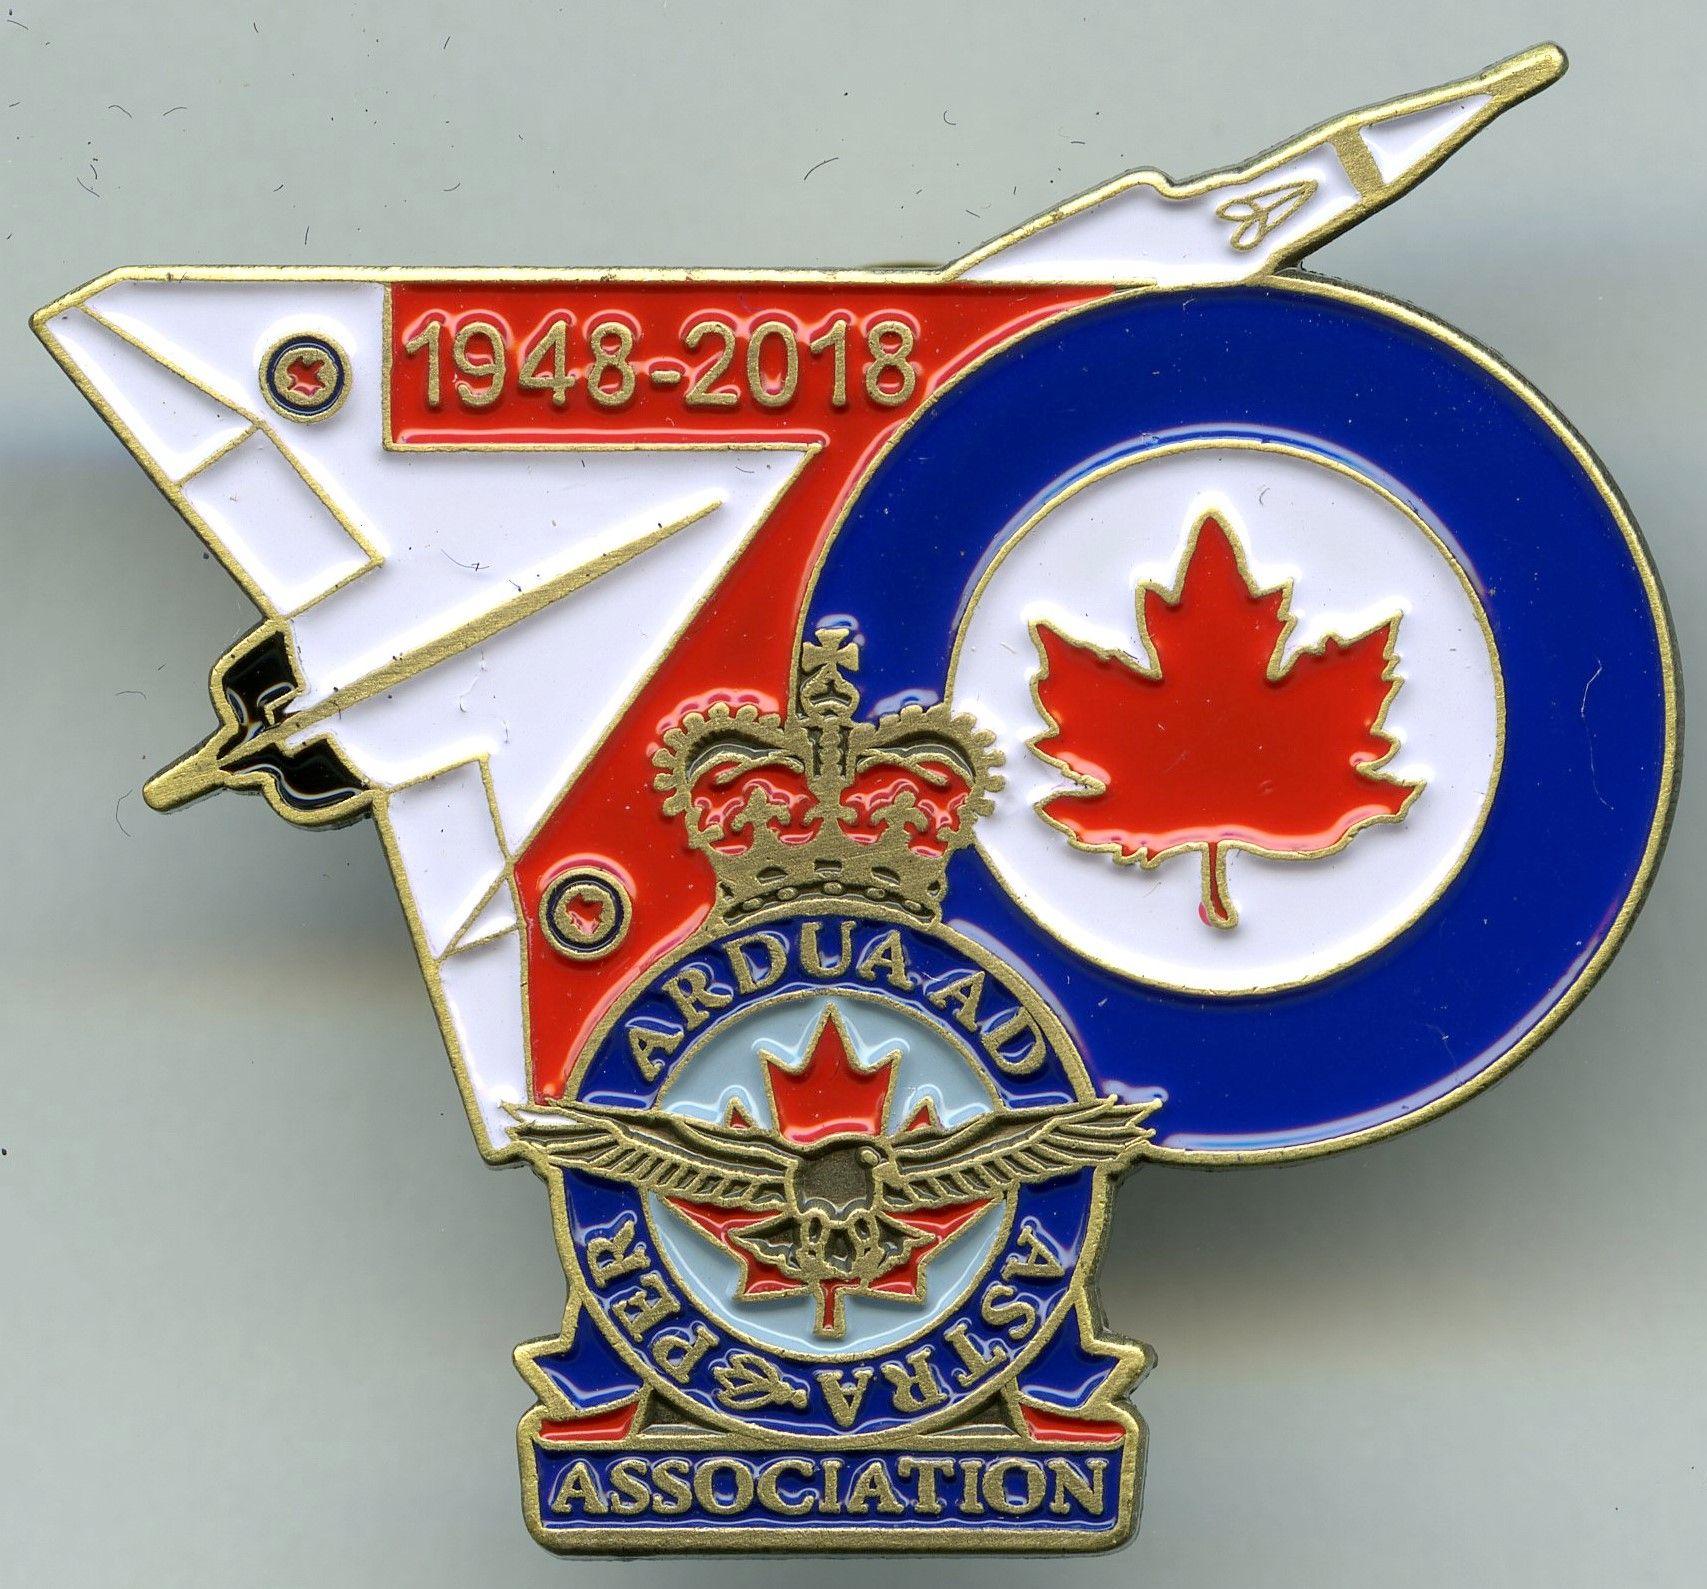 Royal Canadian Air Force Association 70th Anniversary Pin